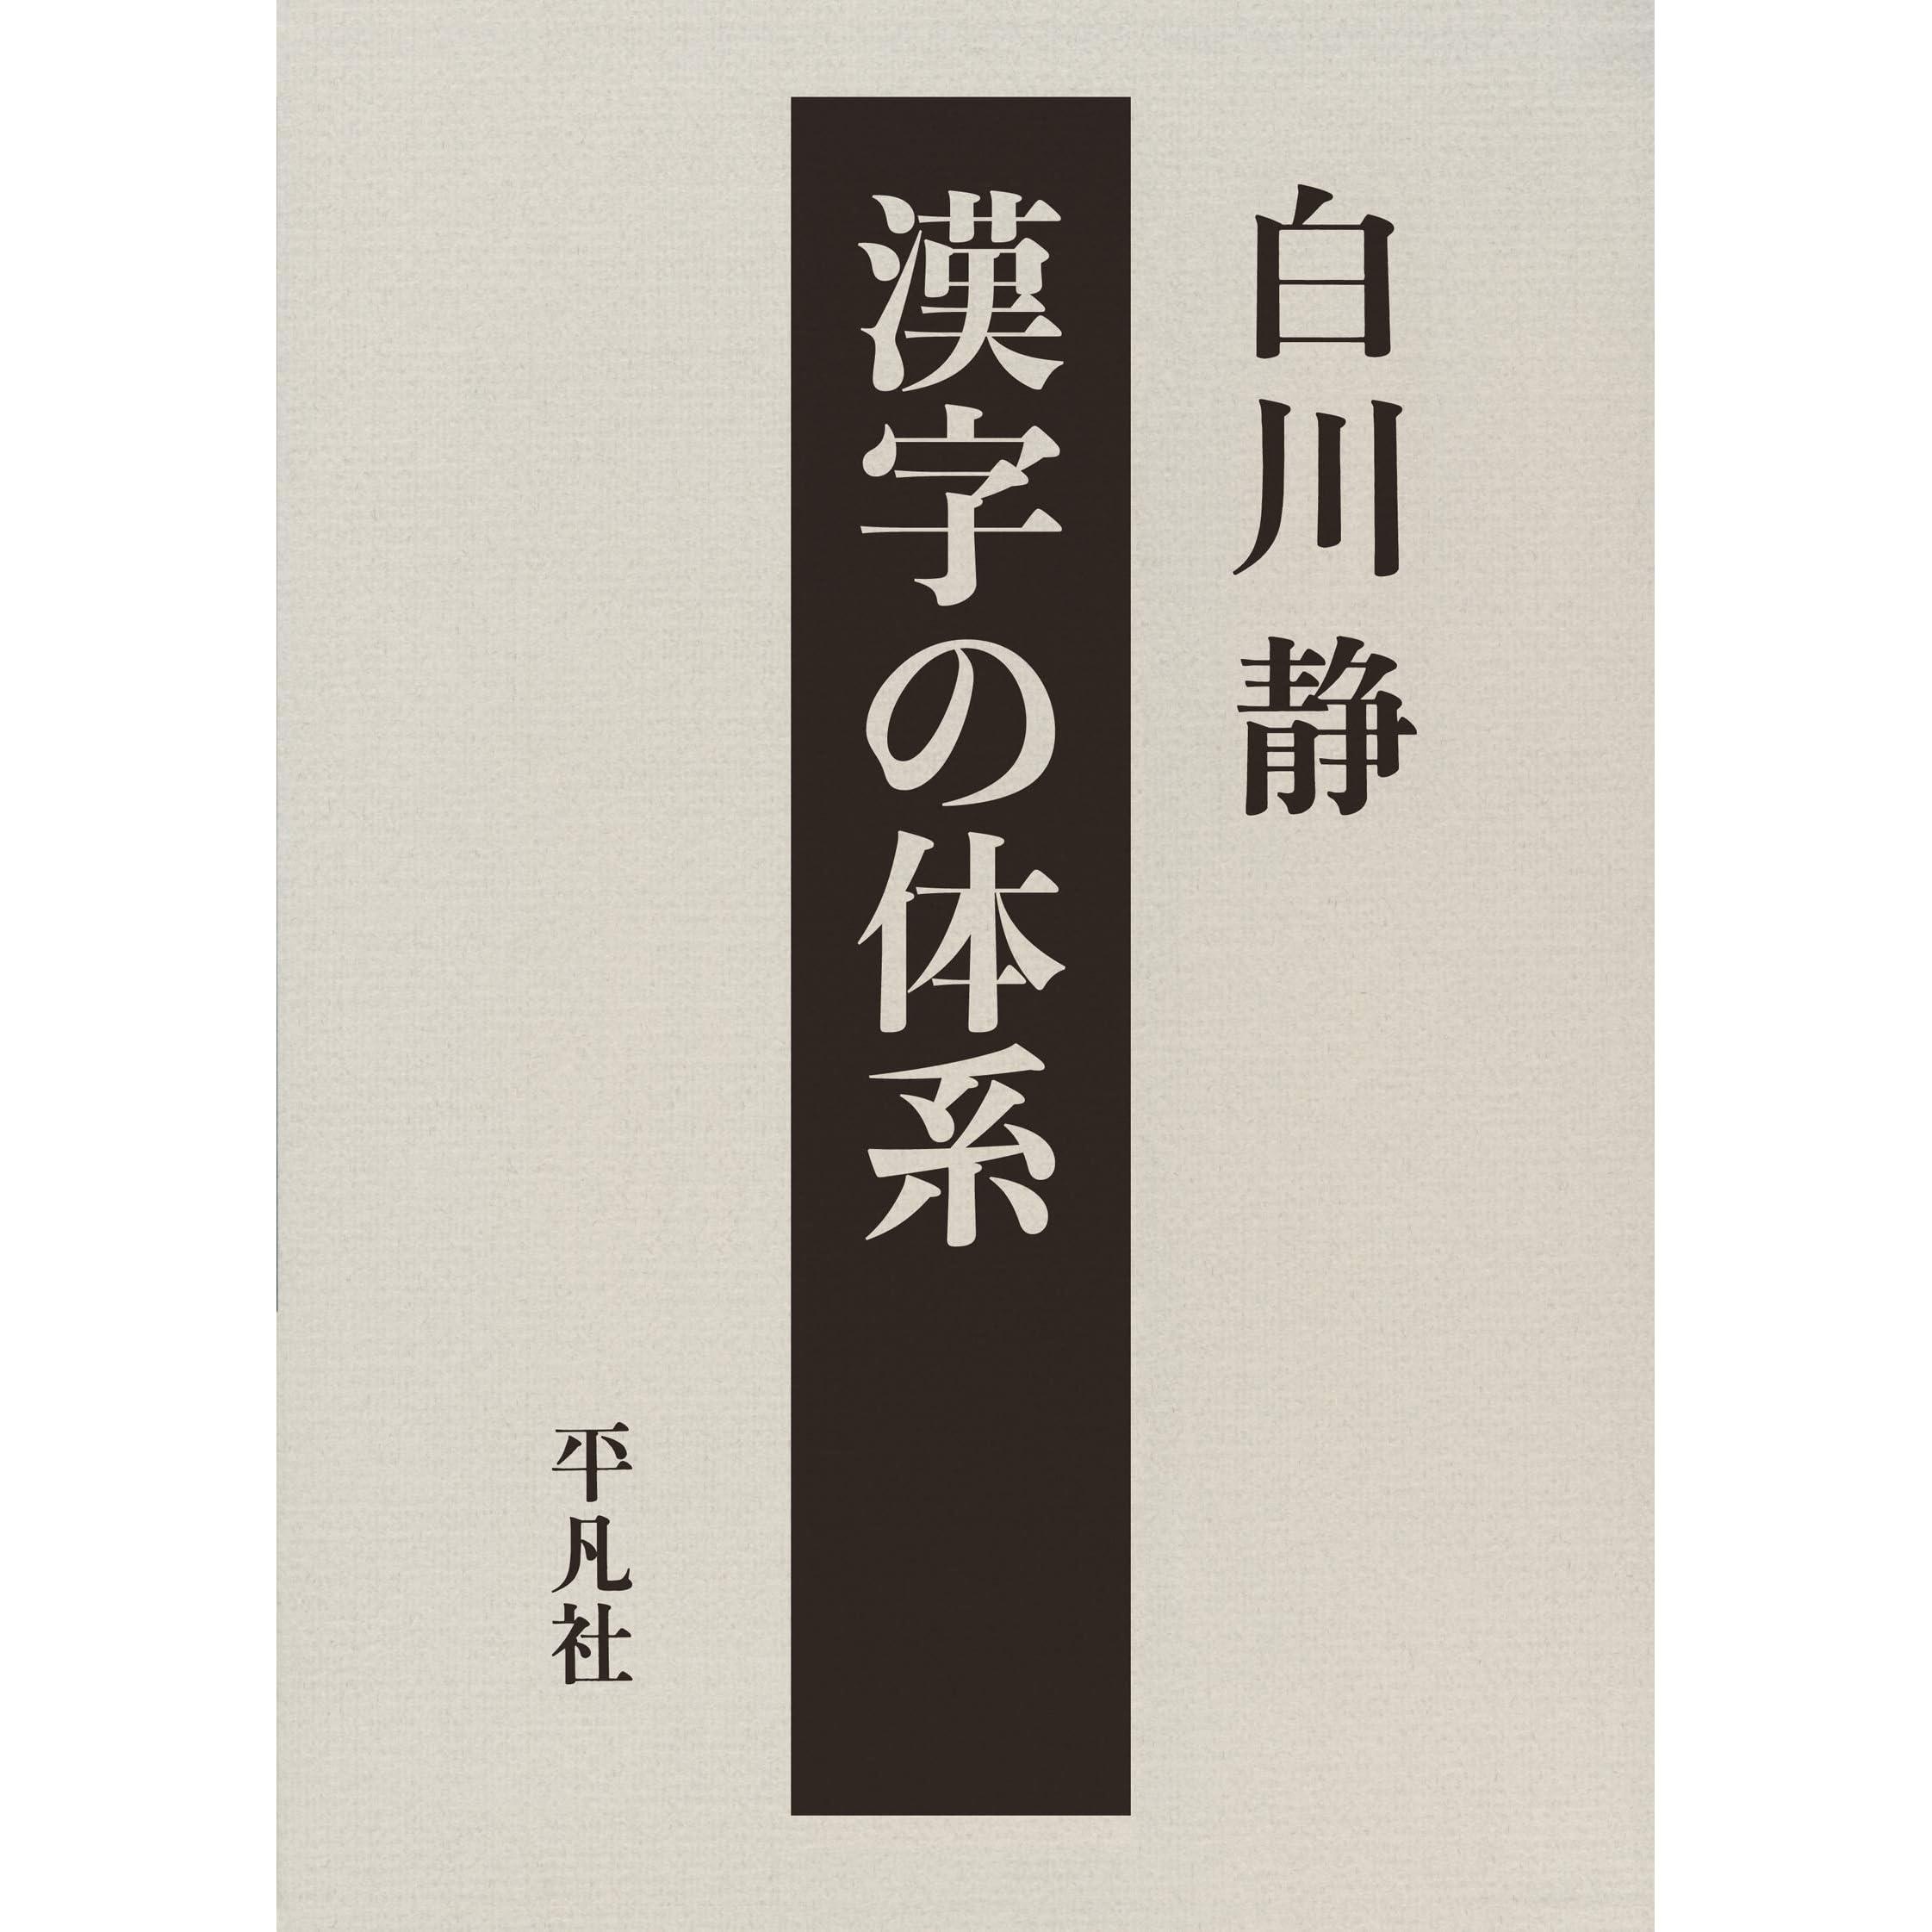 漢字の体系 by 白川 静